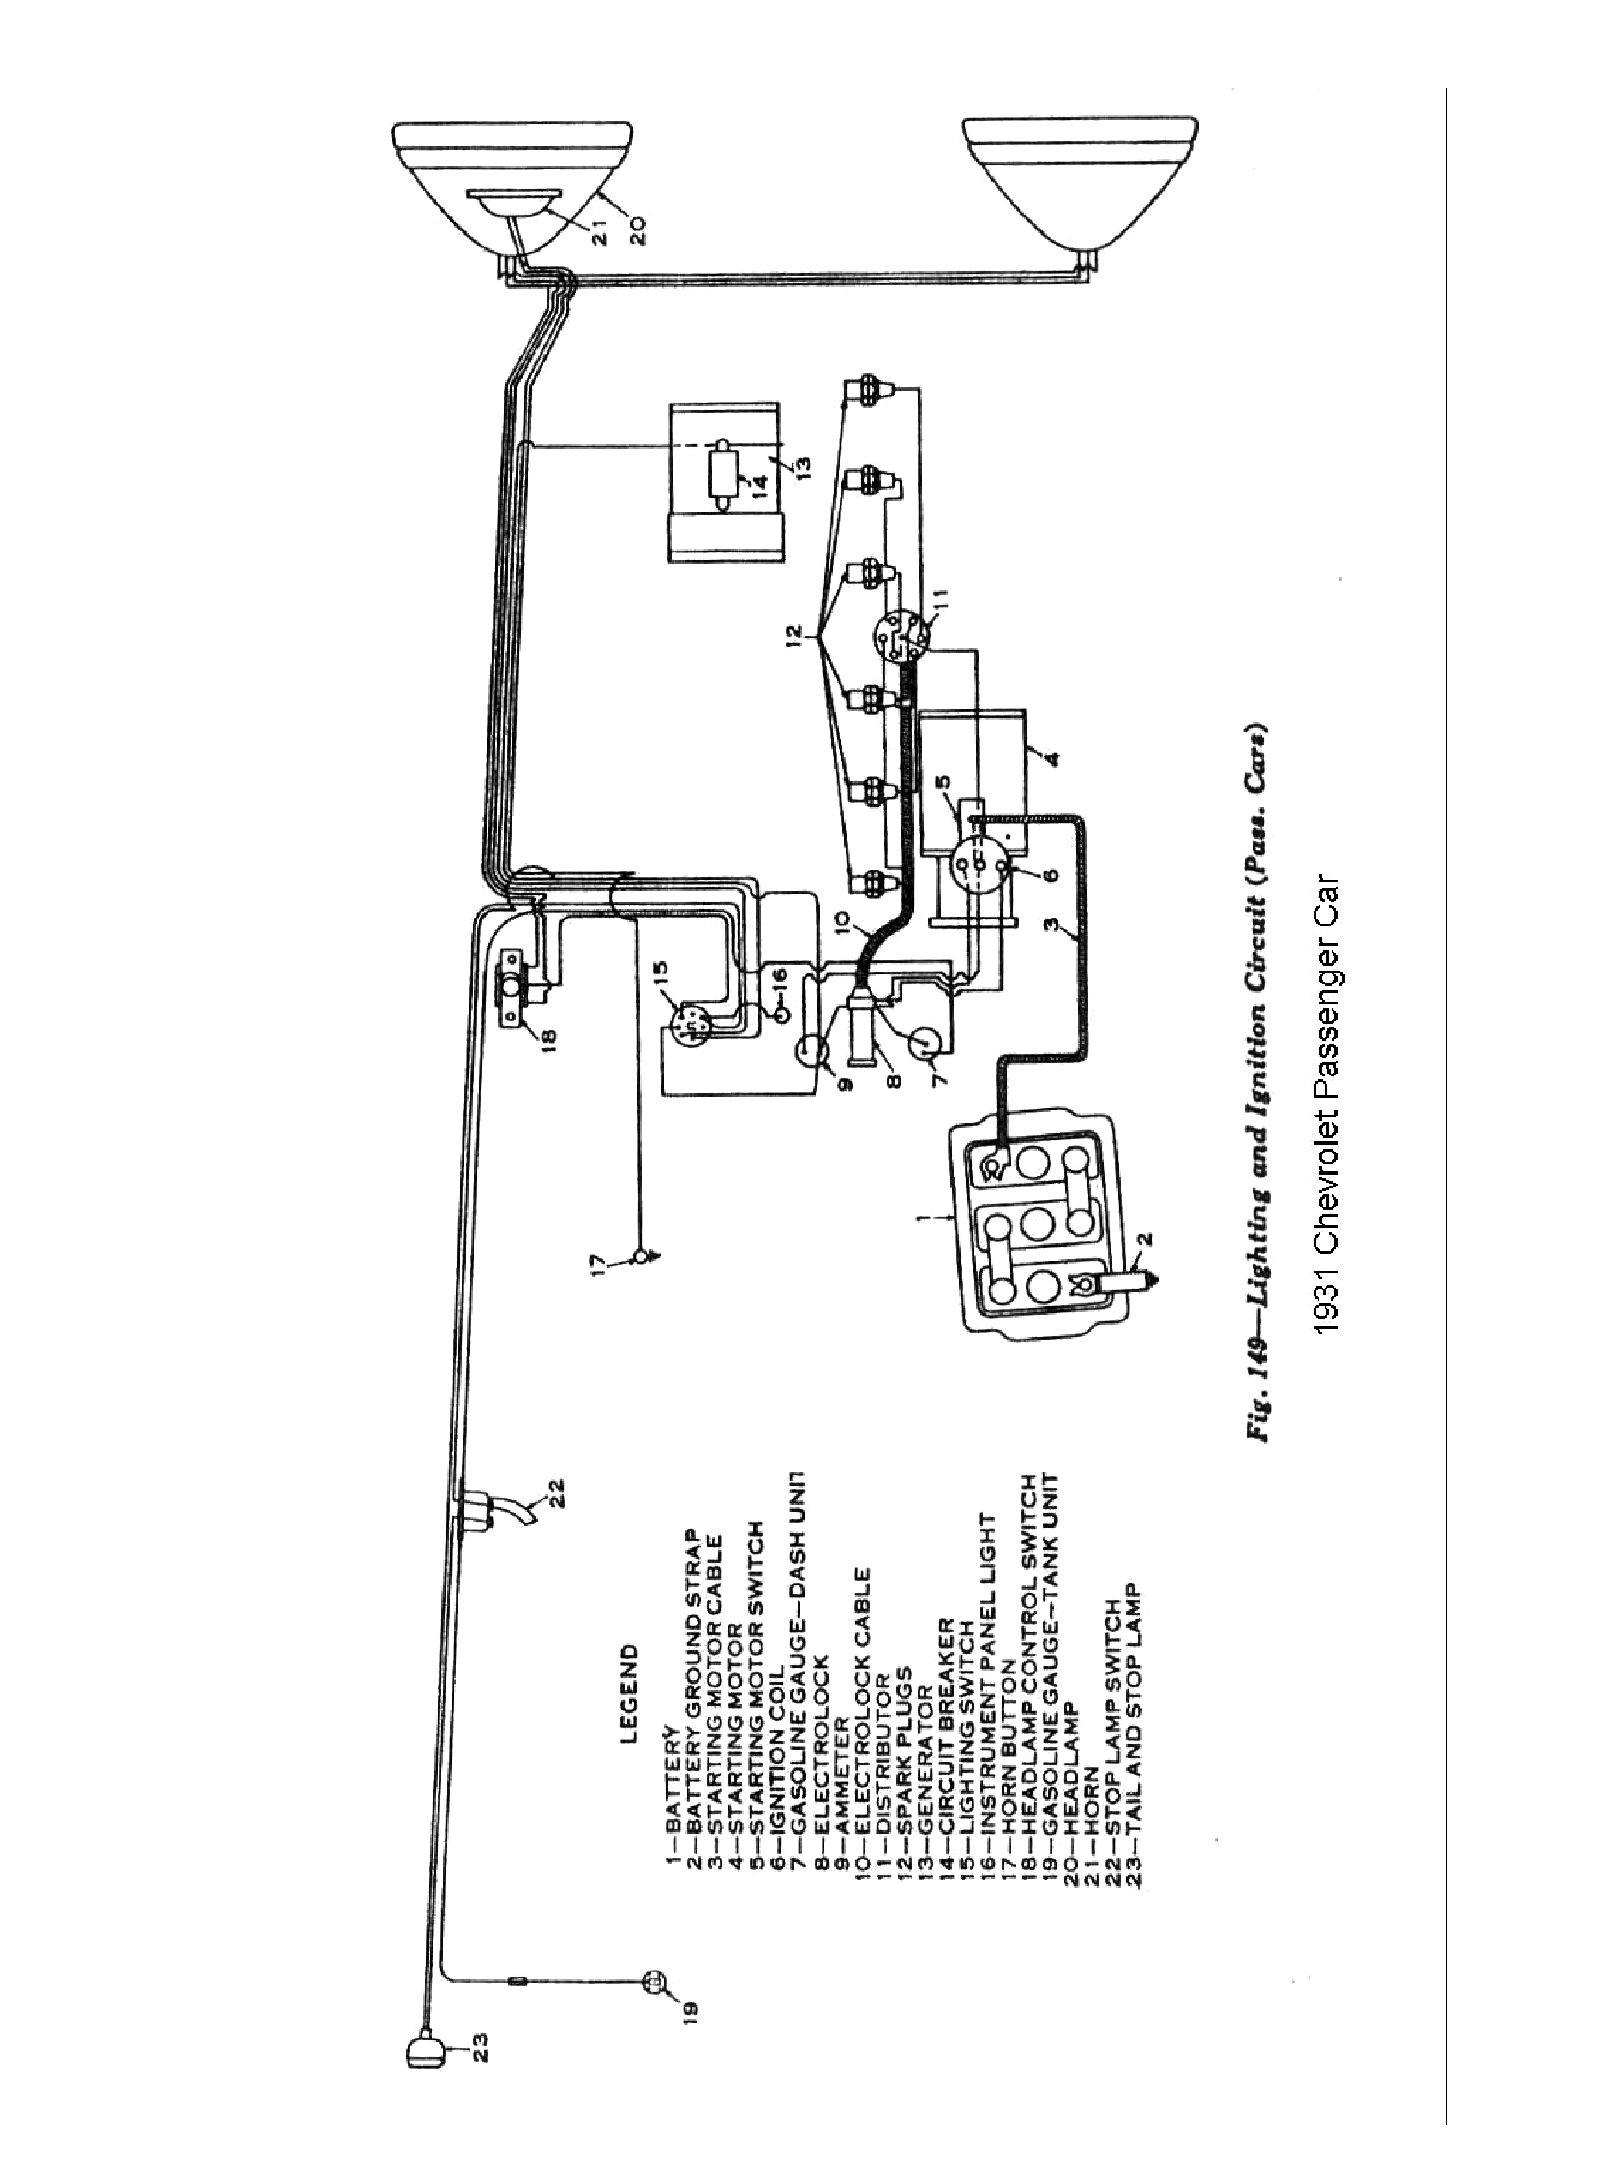 Oil Pressure Gauge Wiring Diagram 1976 Torino Just Another Vdo Diagrams Libraries Rh W36 Mo Stein De